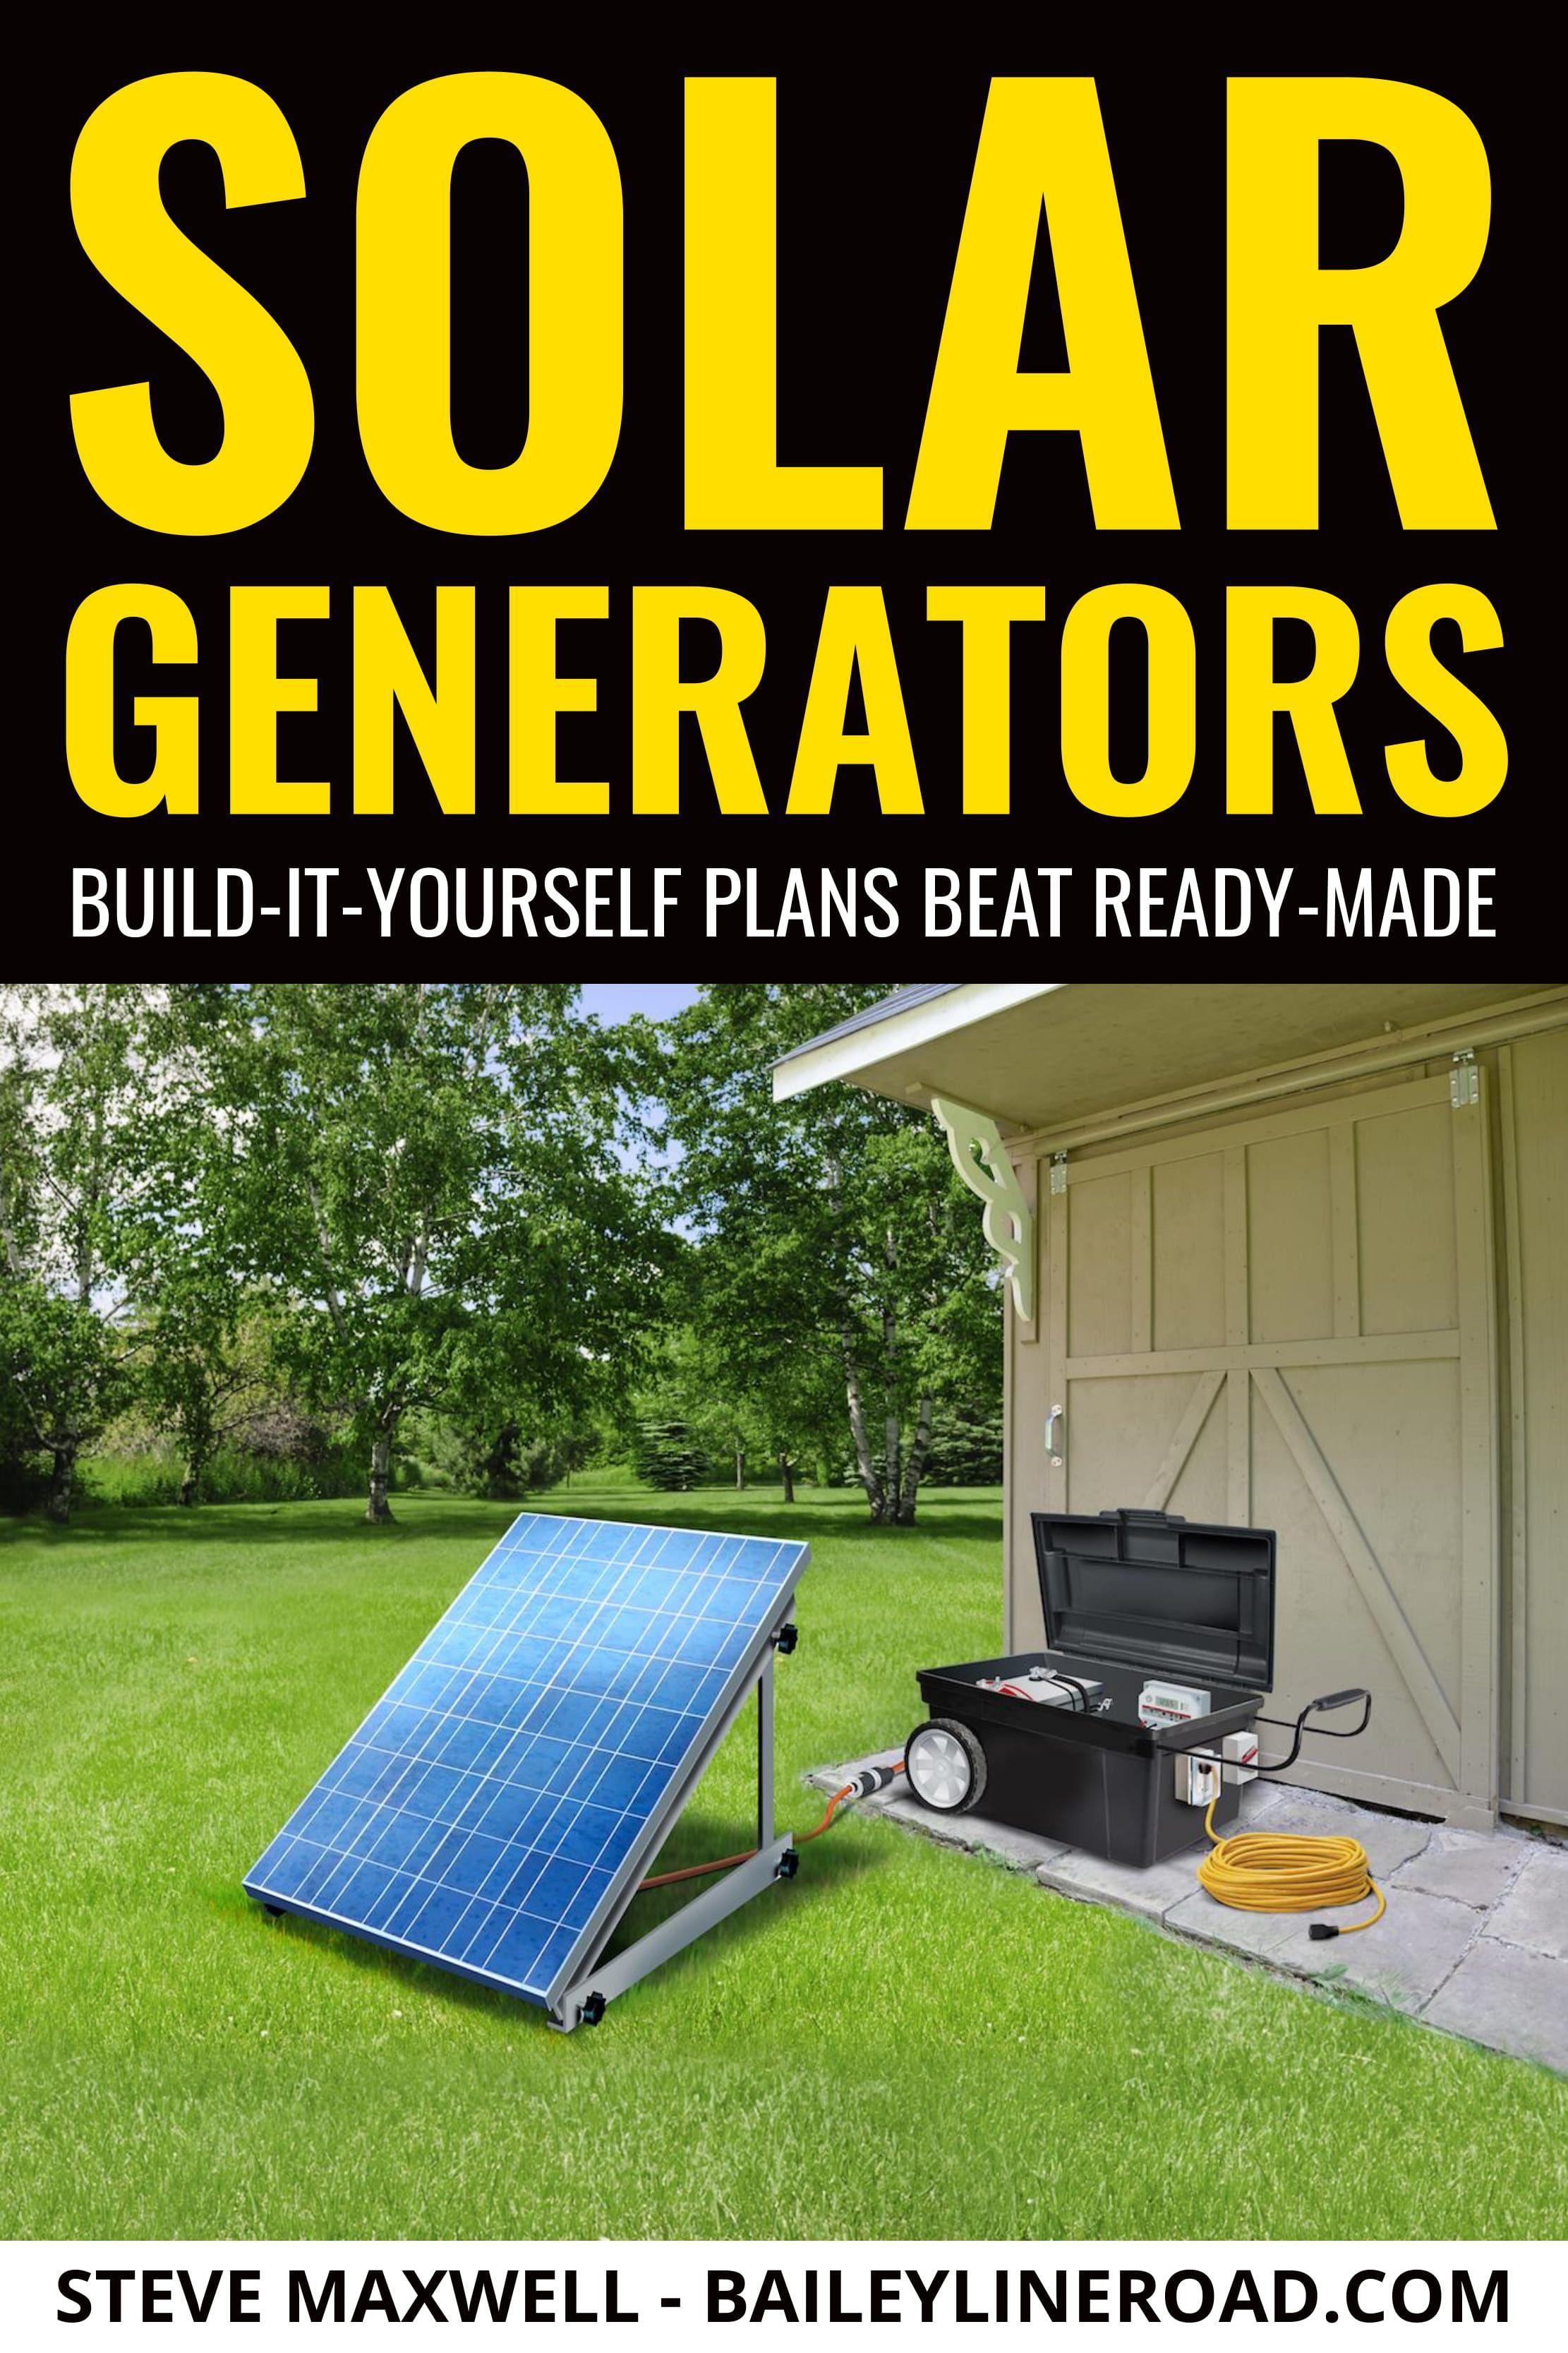 Diy Solar Generators Build It Yourself Beats Ready Made Solar Panels Solar Best Solar Panels